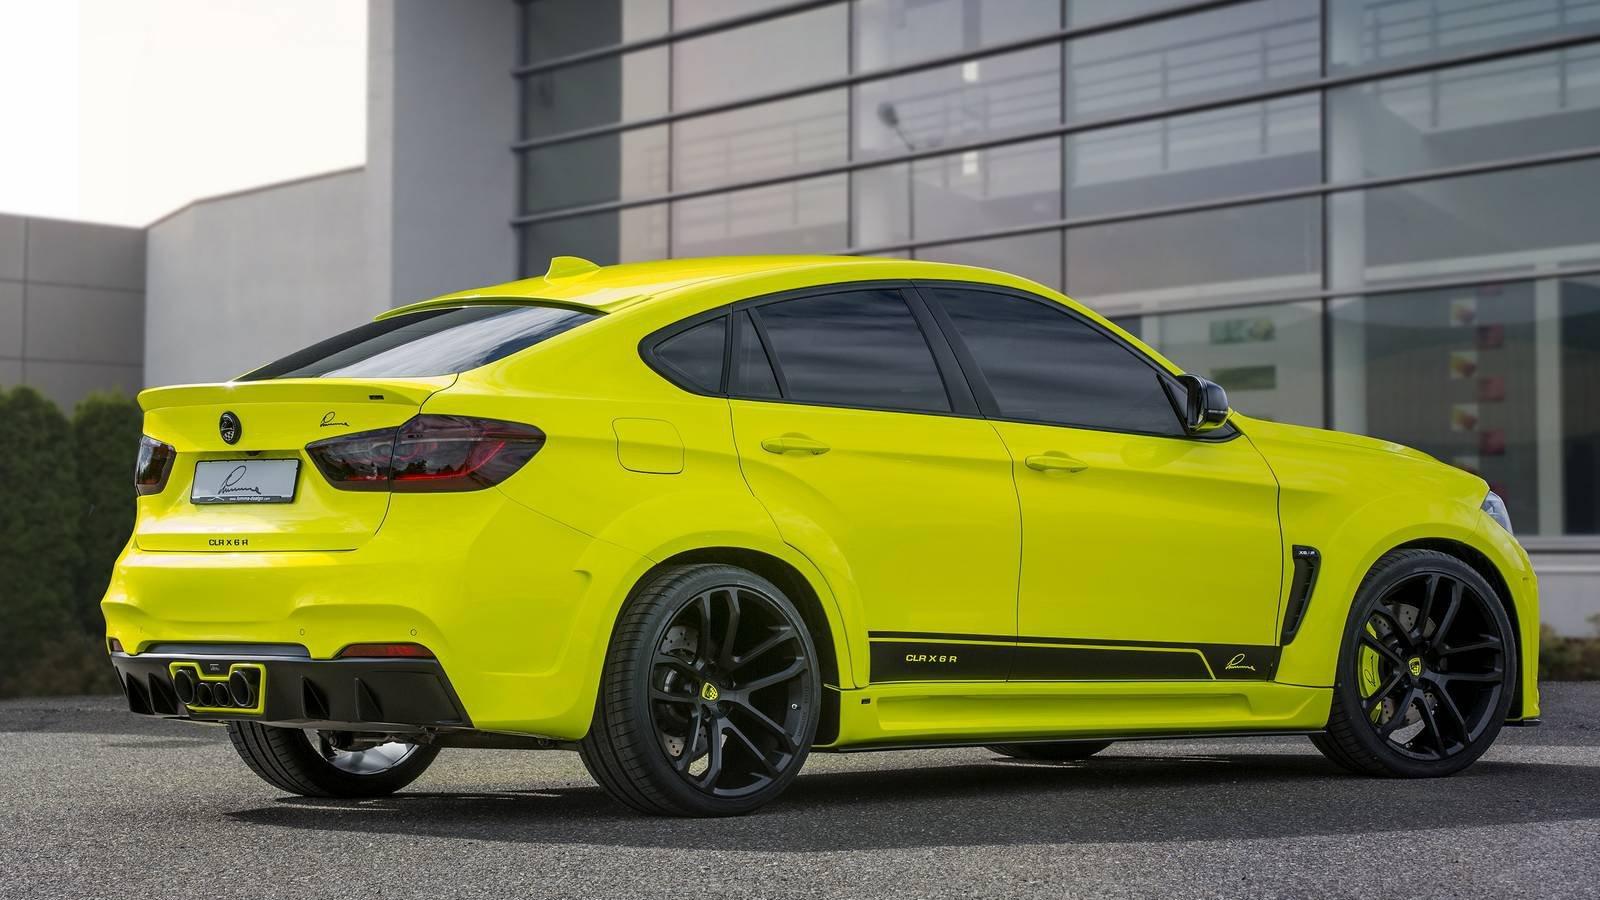 BMW X6 M Lumma Design